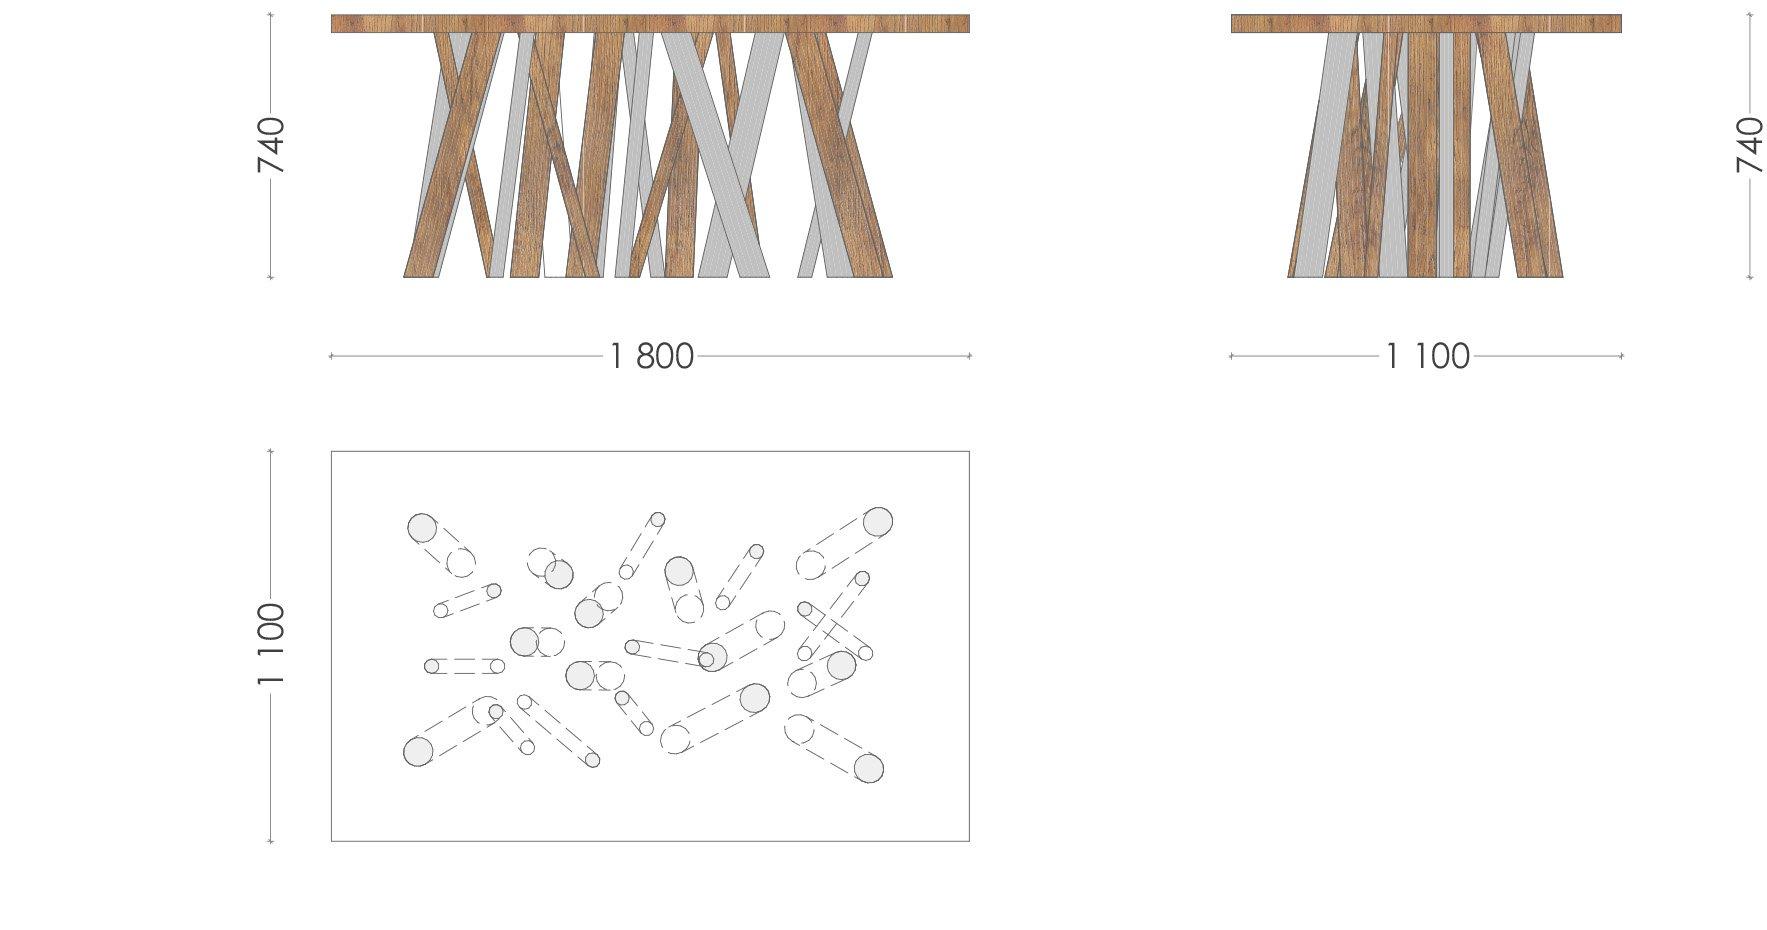 image-1-0: object-roshcha-table